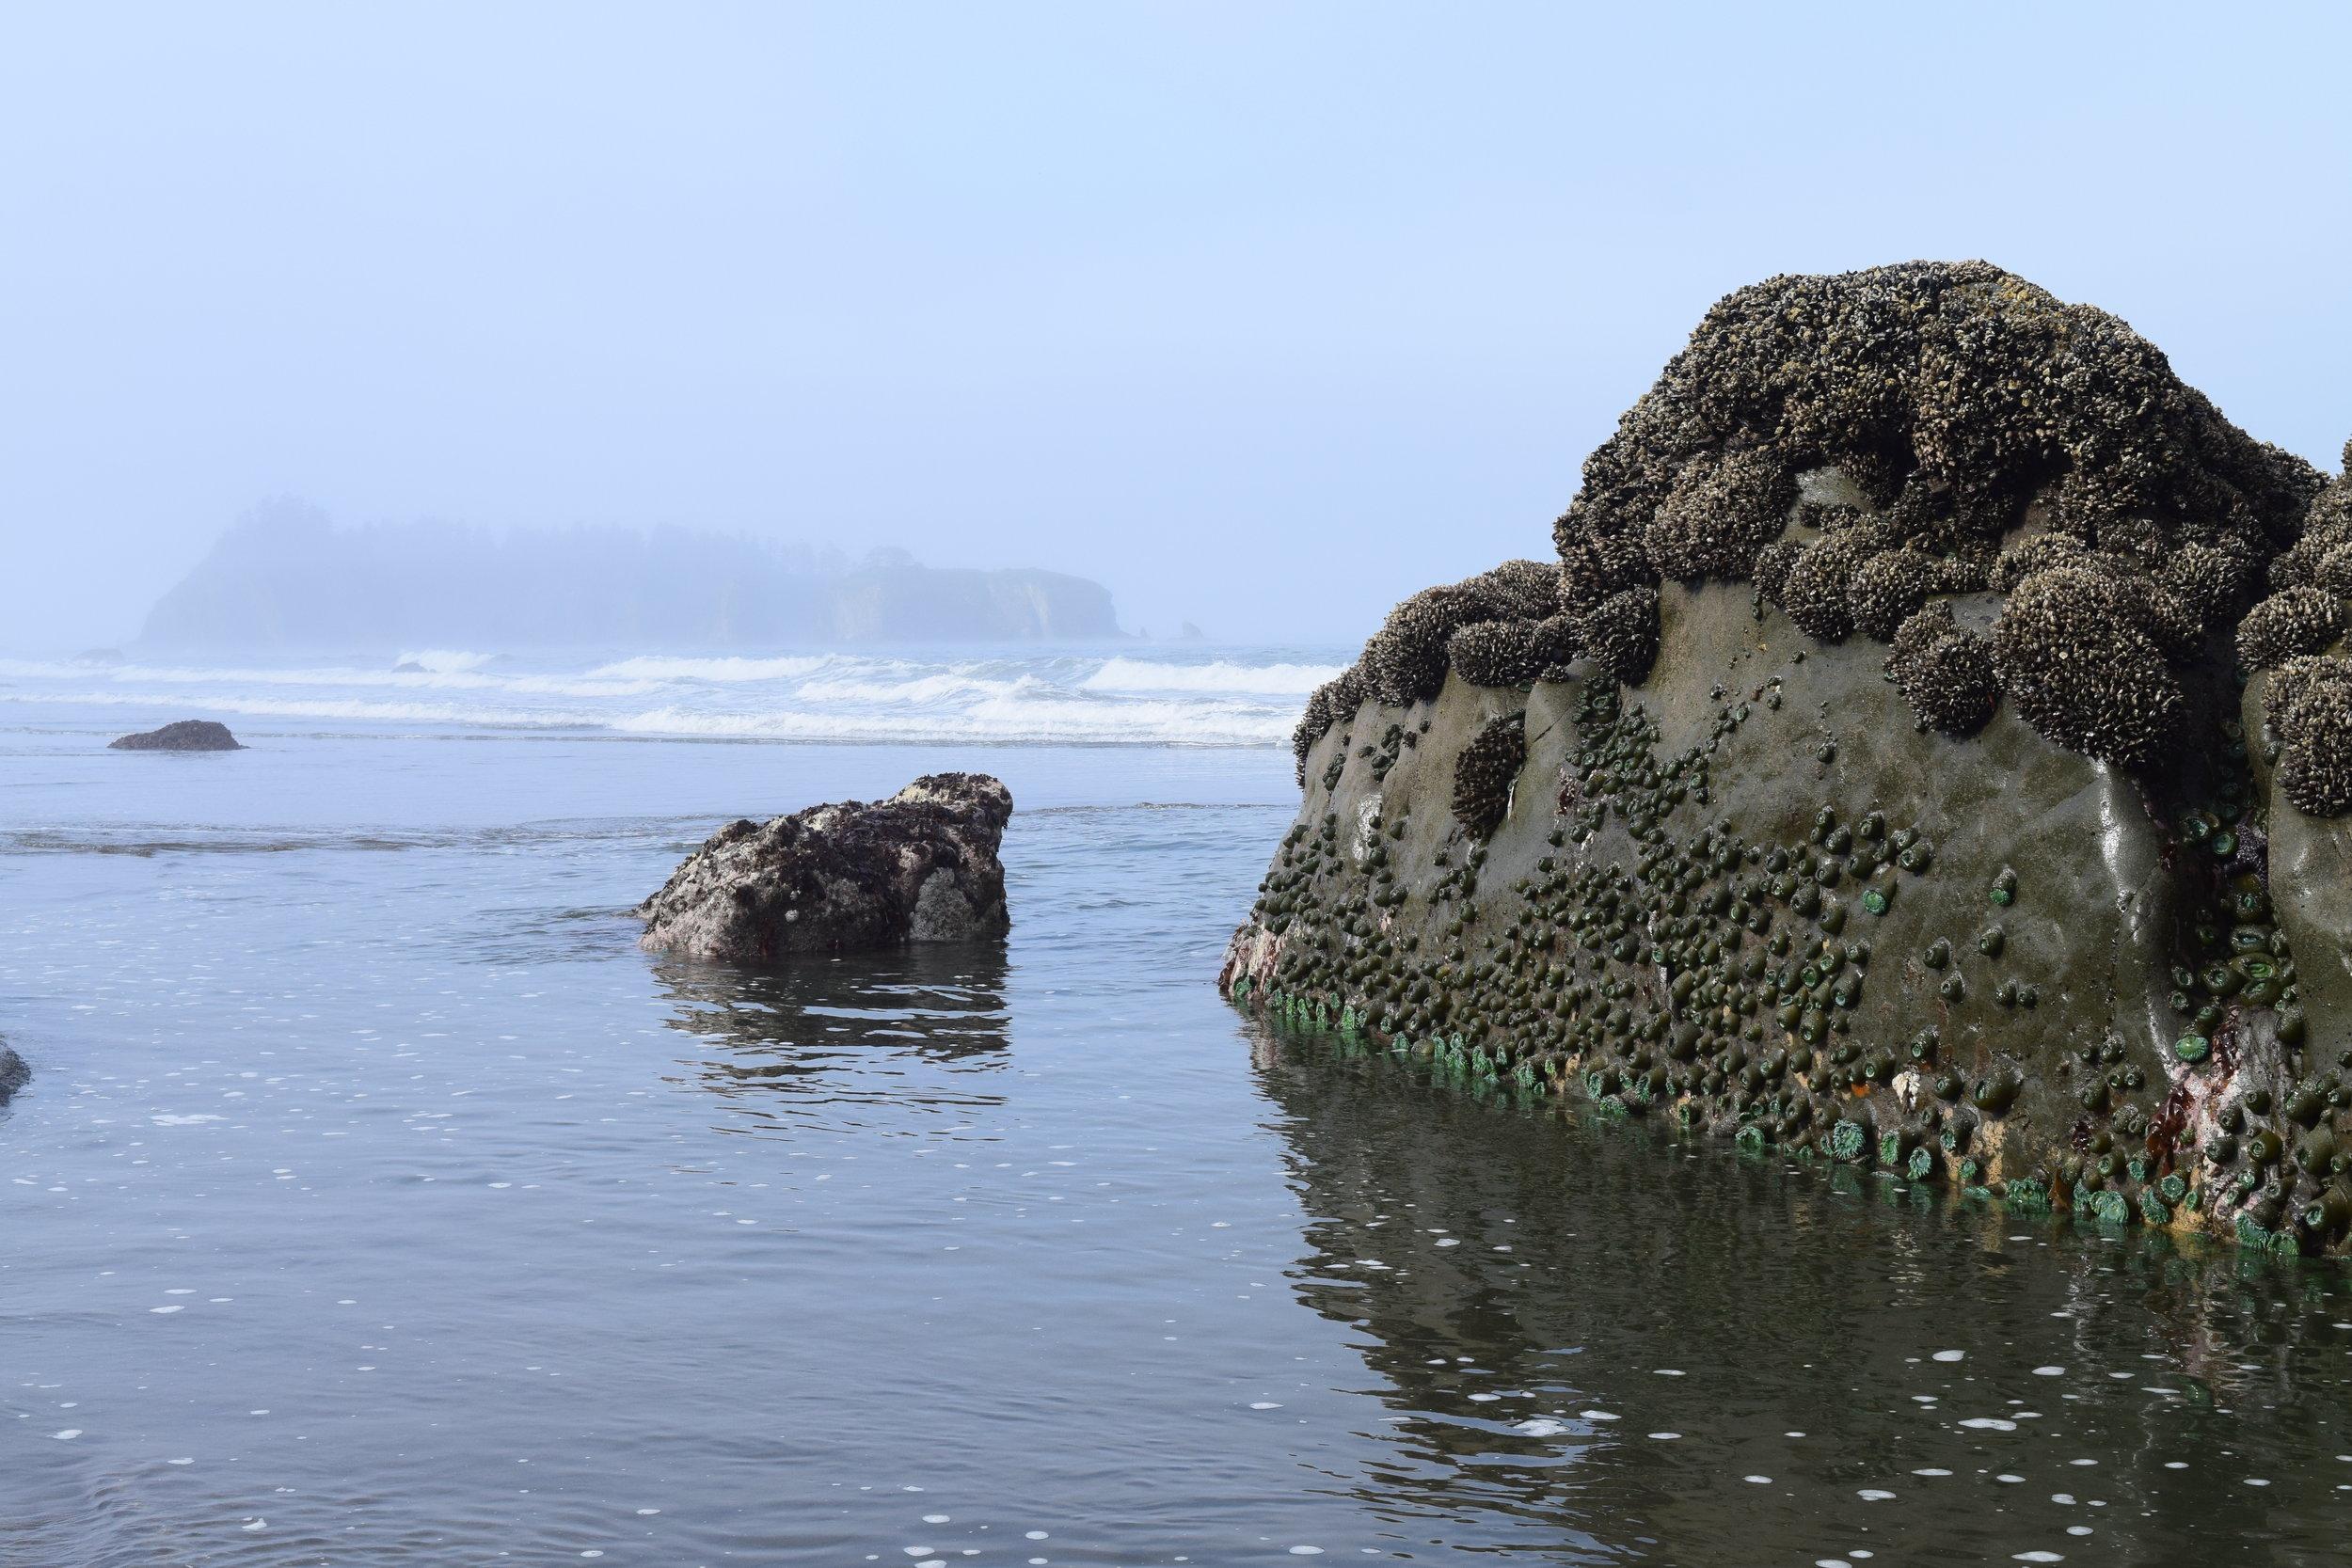 Tidepool Sealife along Rialto Beach